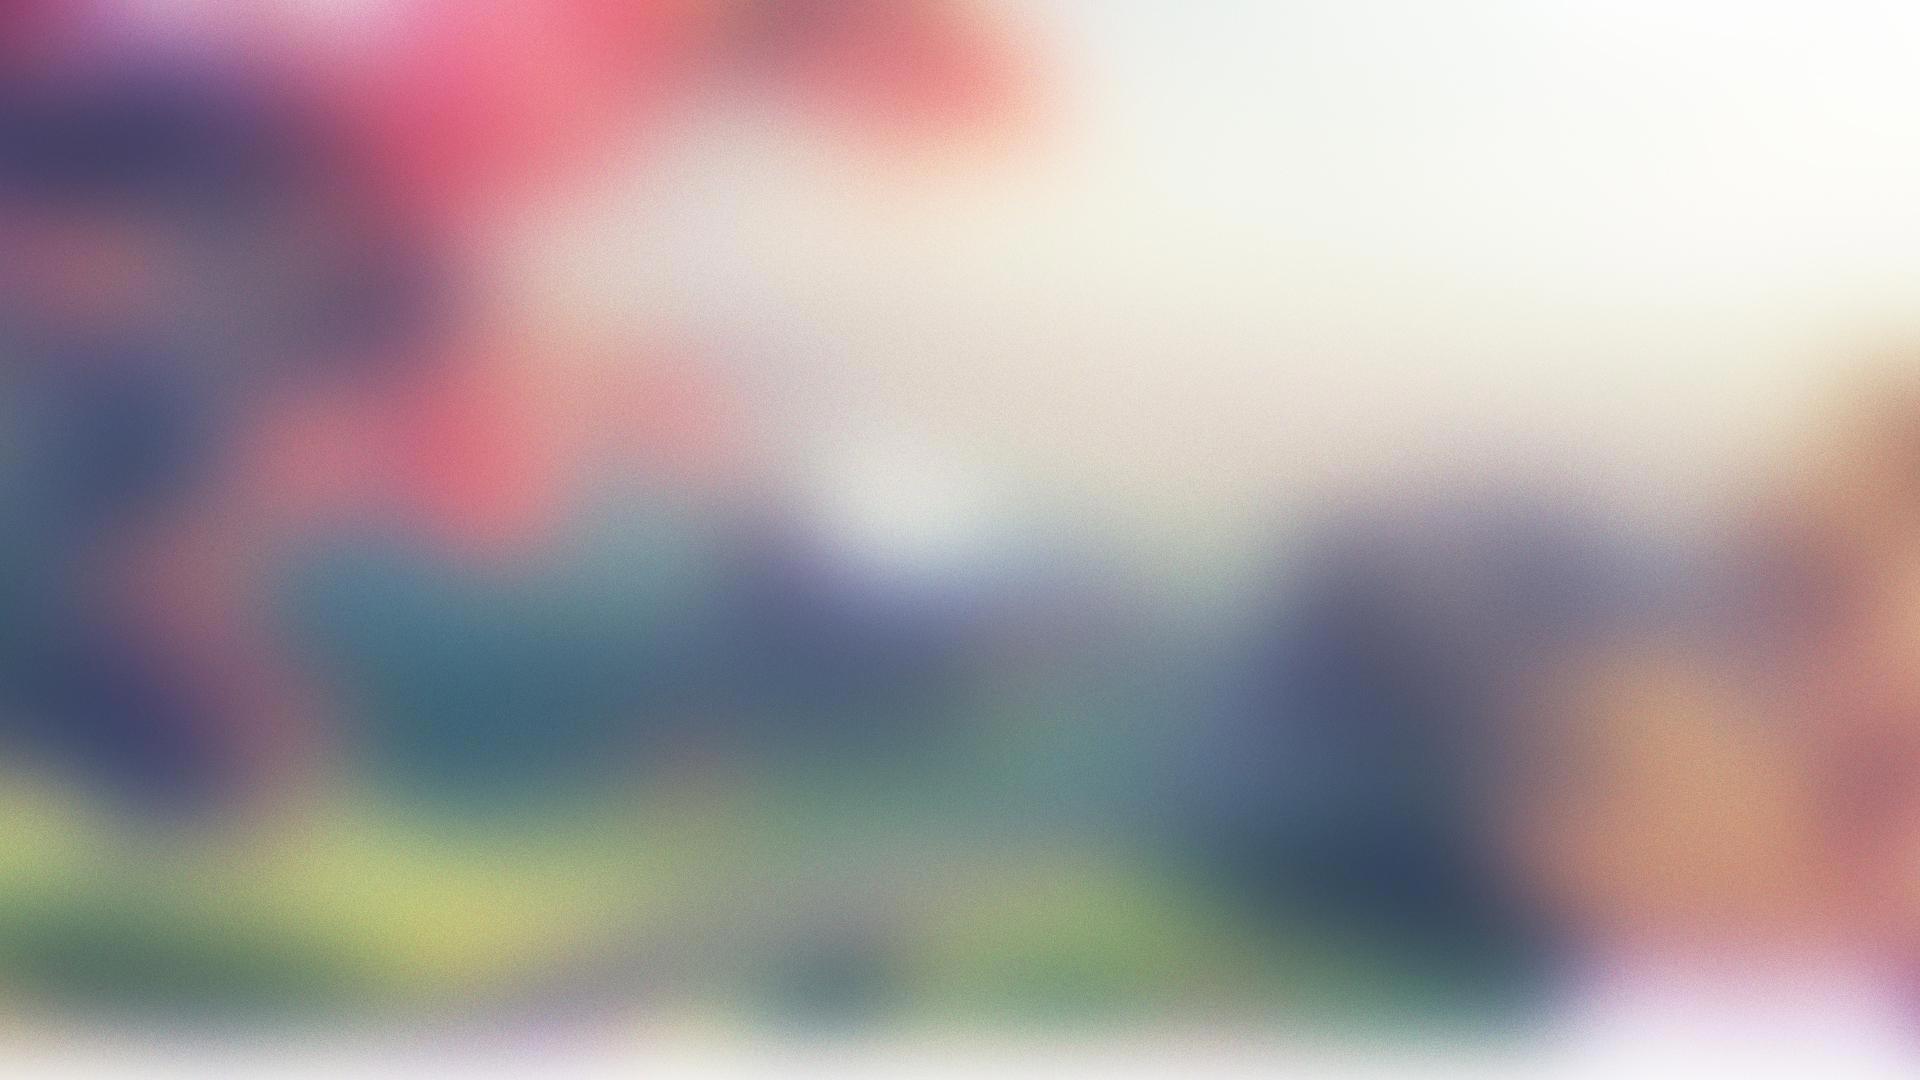 full screen background image